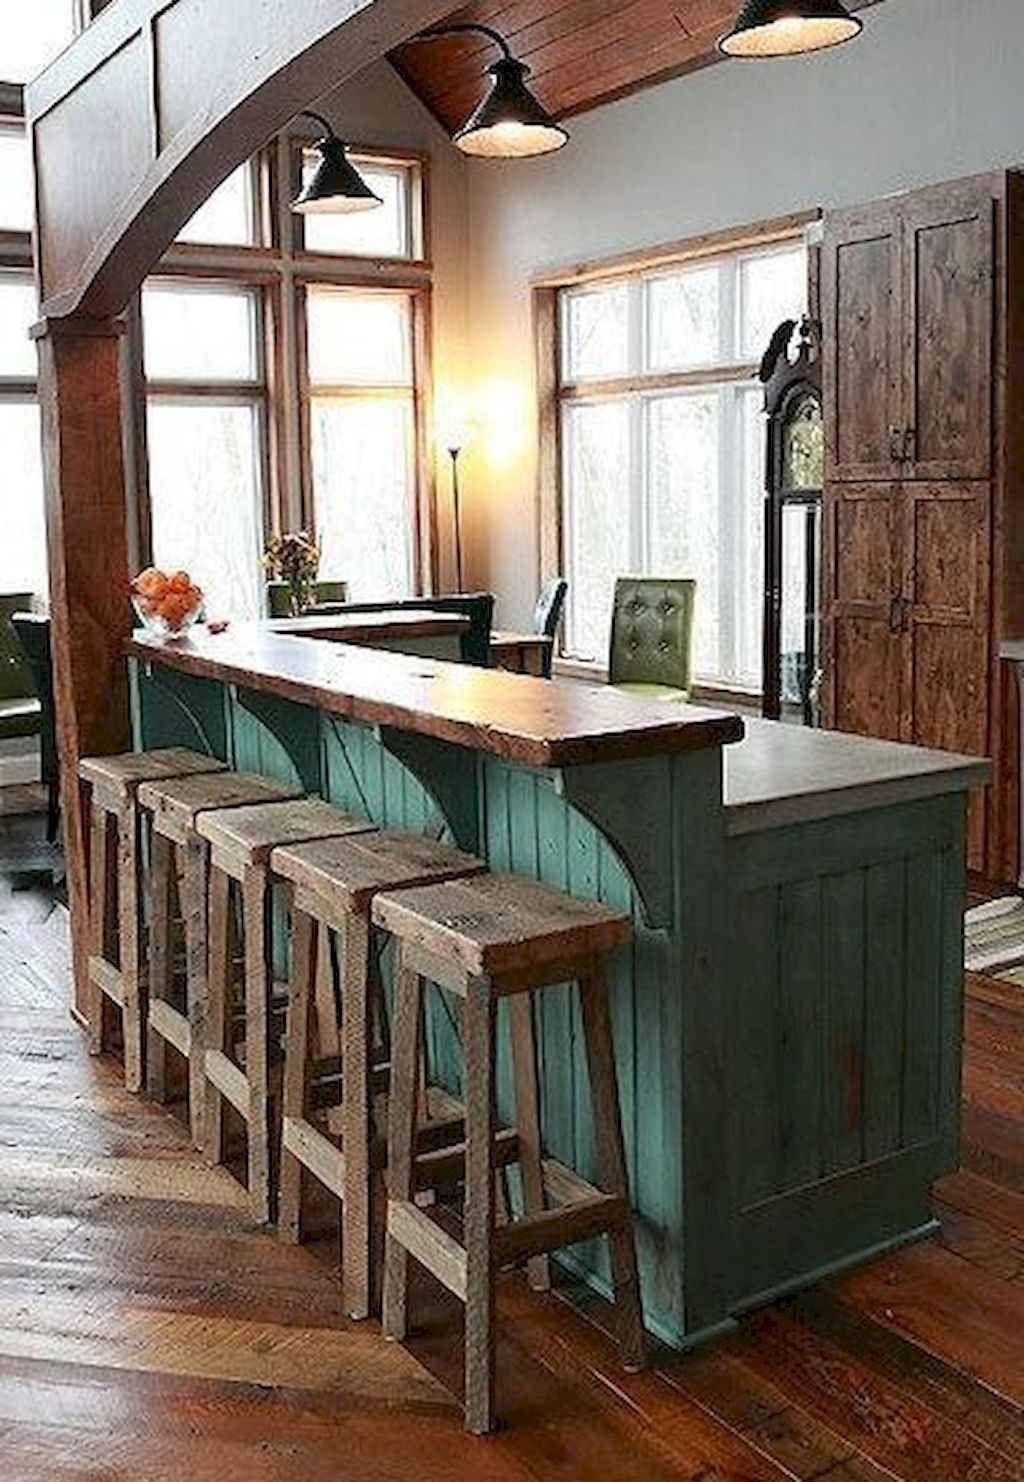 26 Best Modern Farmhouse Kitchen Cabinets Ideas - Gladecor.com in 2020 | Rustic kitchen island ...